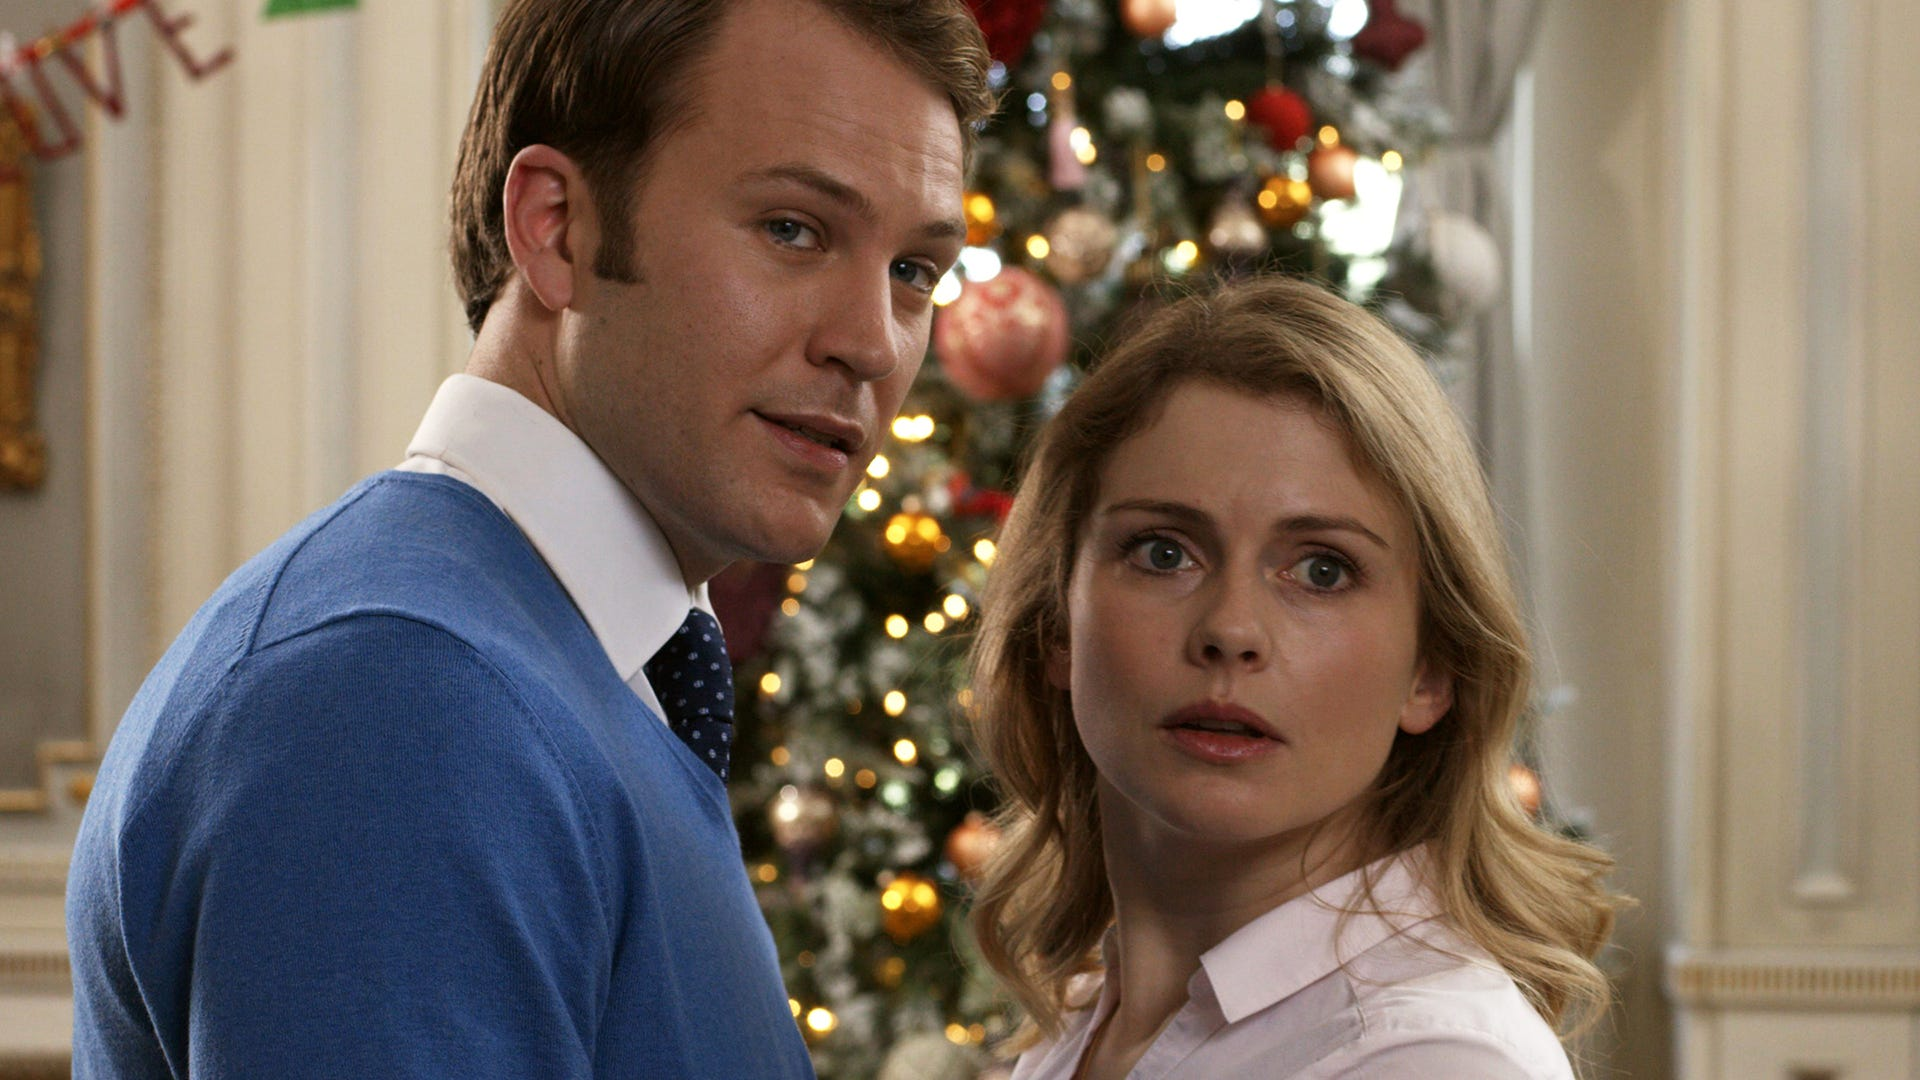 Rose McIver and Ben Lamb, A Christmas Prince: The Royal Wedding